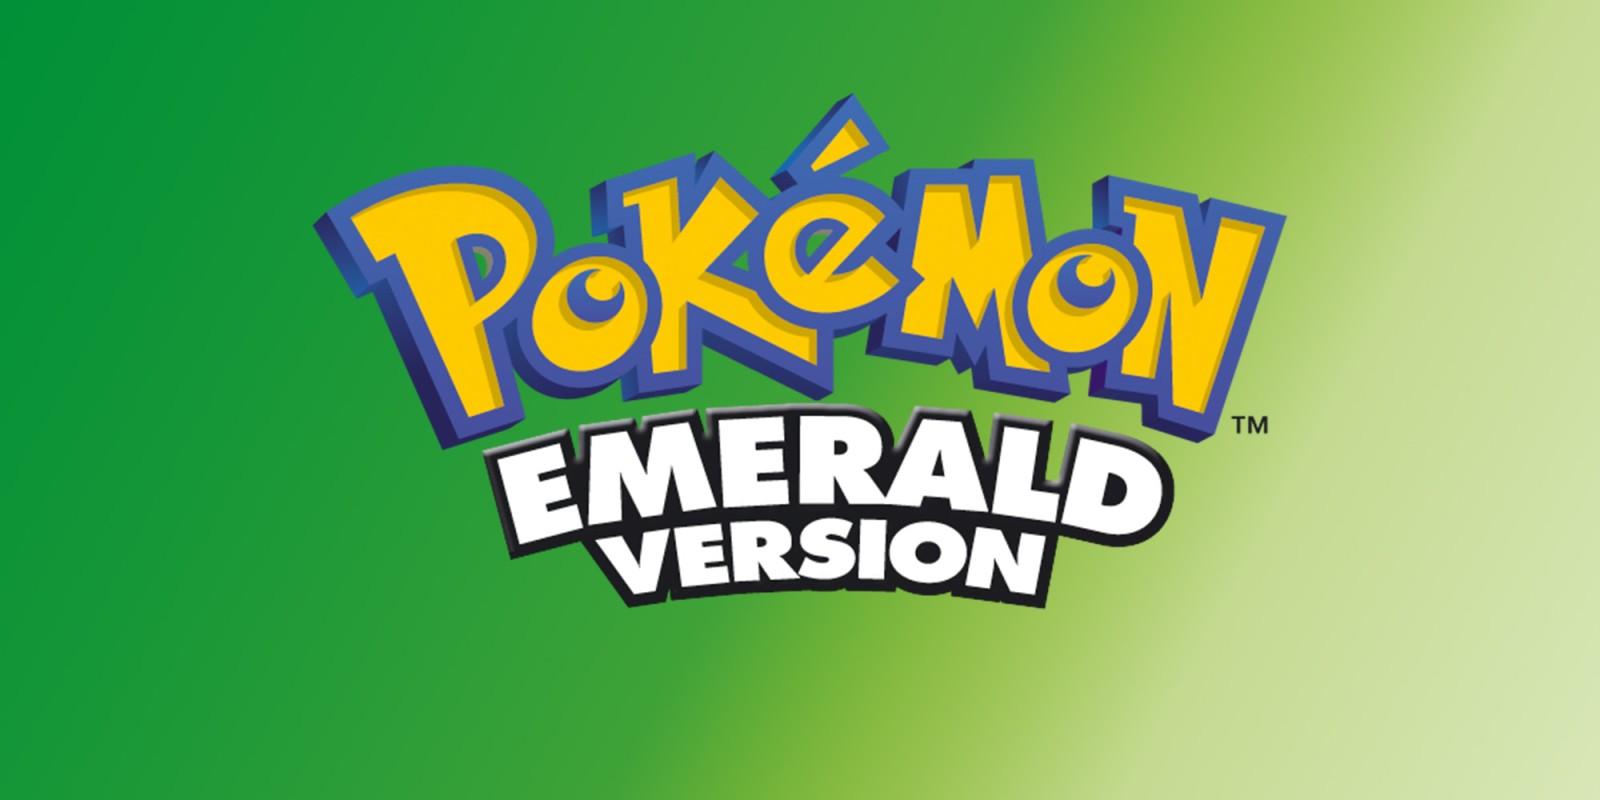 Pok mon Emerald Version USA - Nintendo Gameboy Advance (GBA) rom download